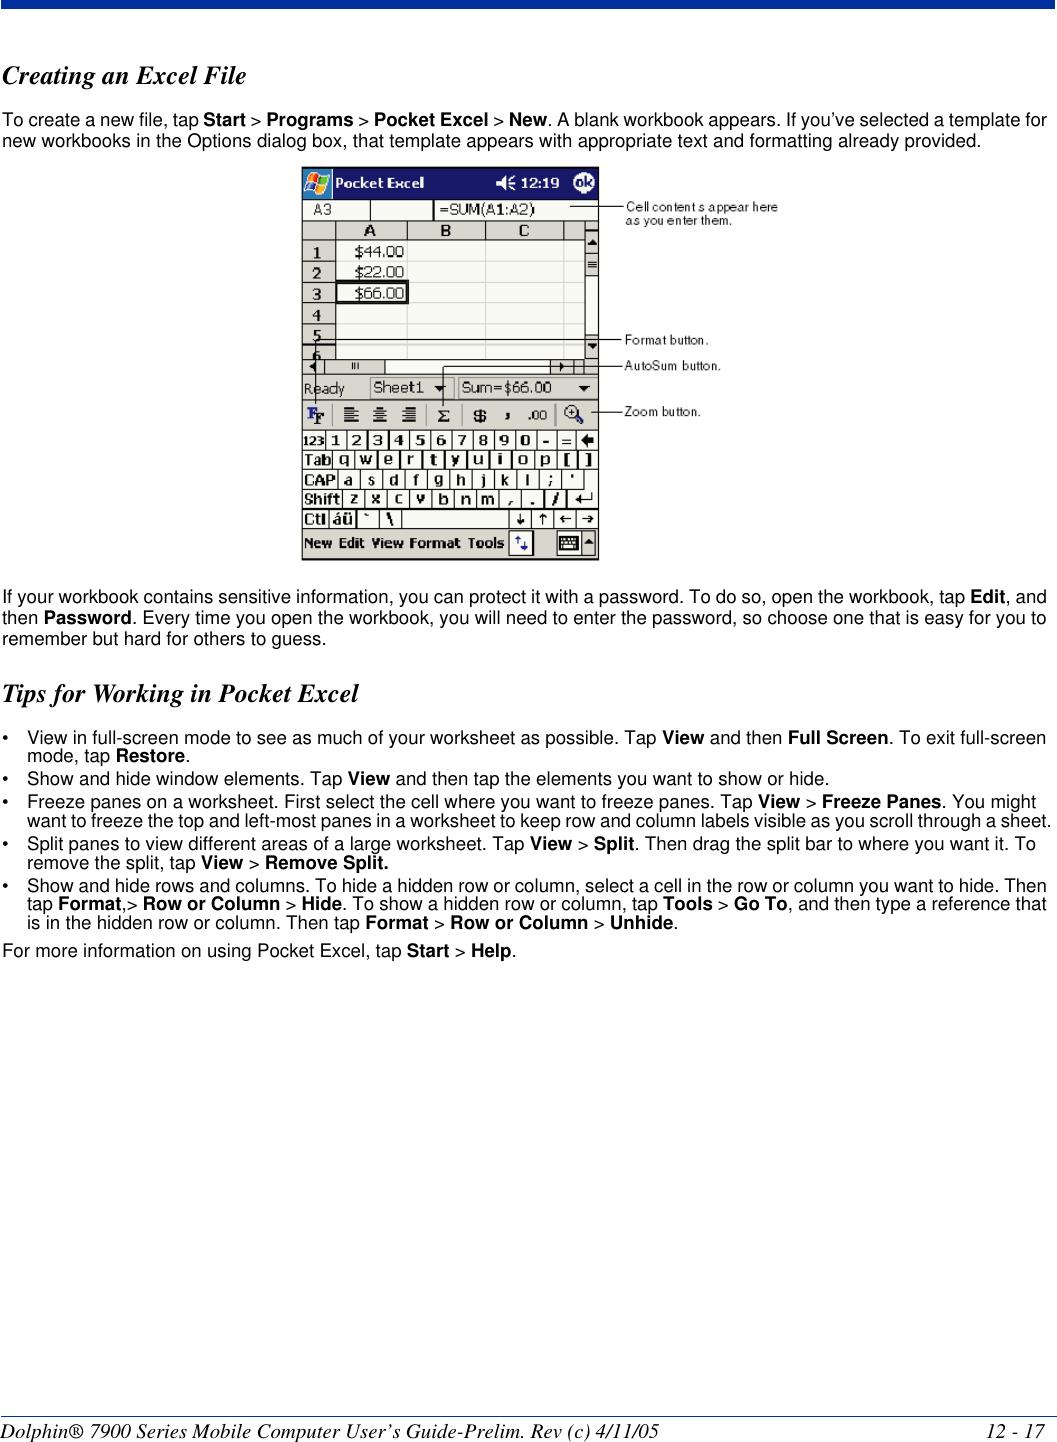 Honeywell Lu0 Dolphin With Gsm And 802 11b Radios